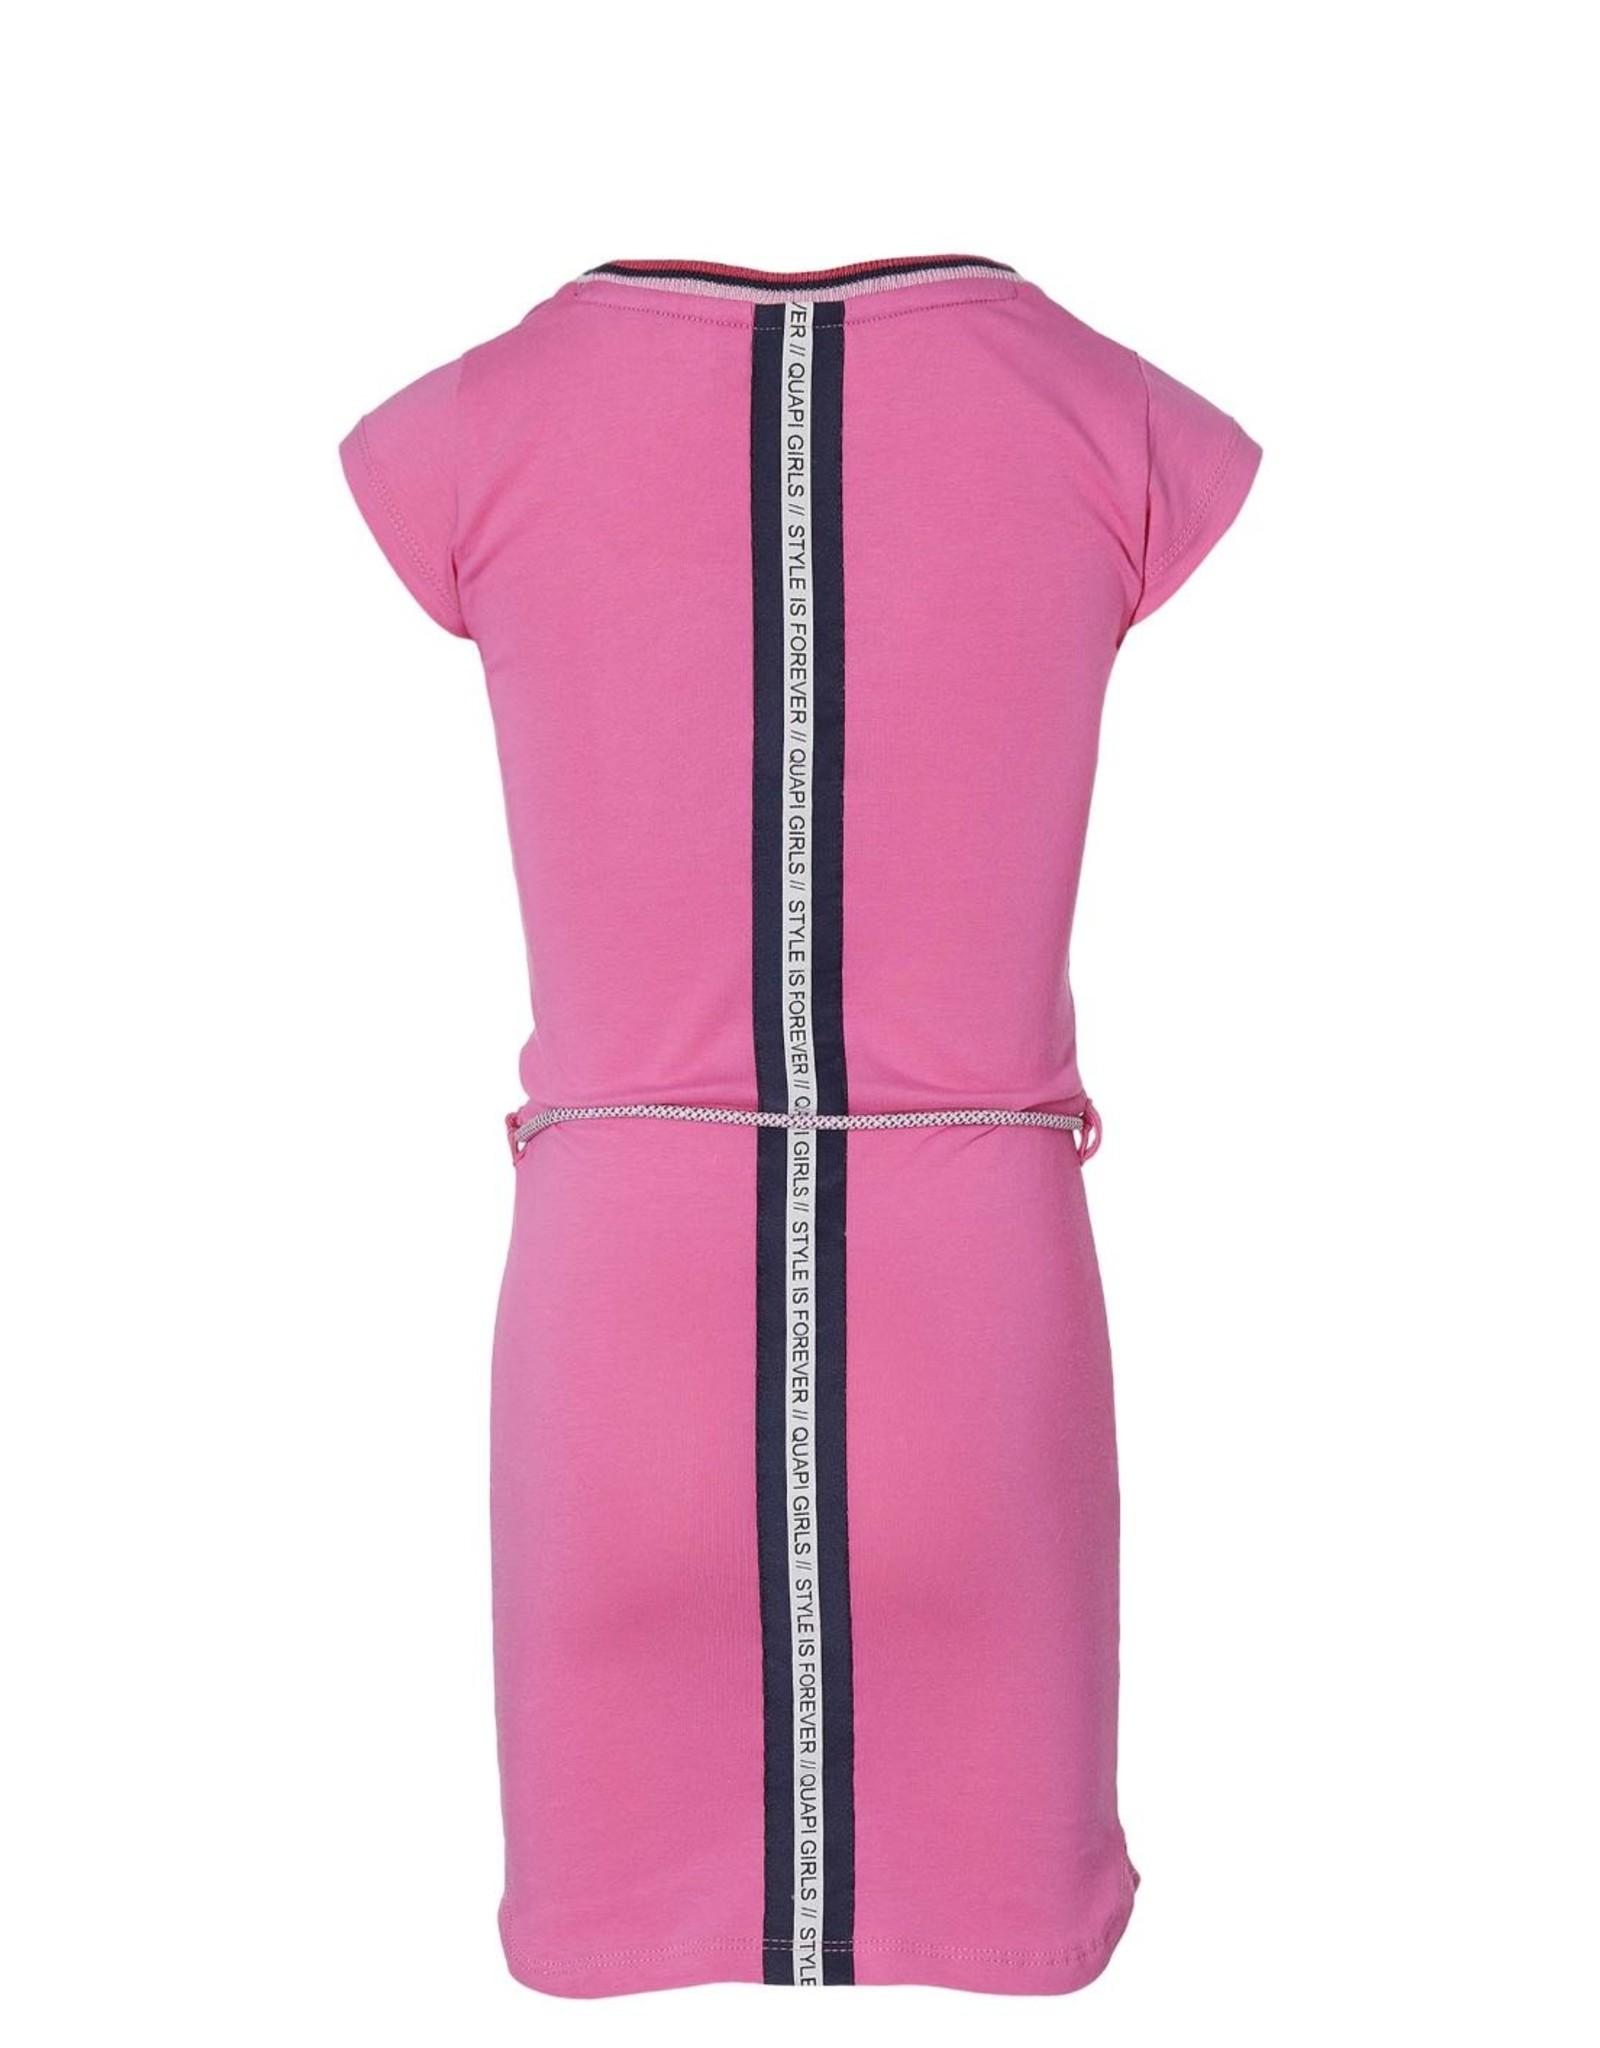 Quapi Quapi jurkje Fab hot pink